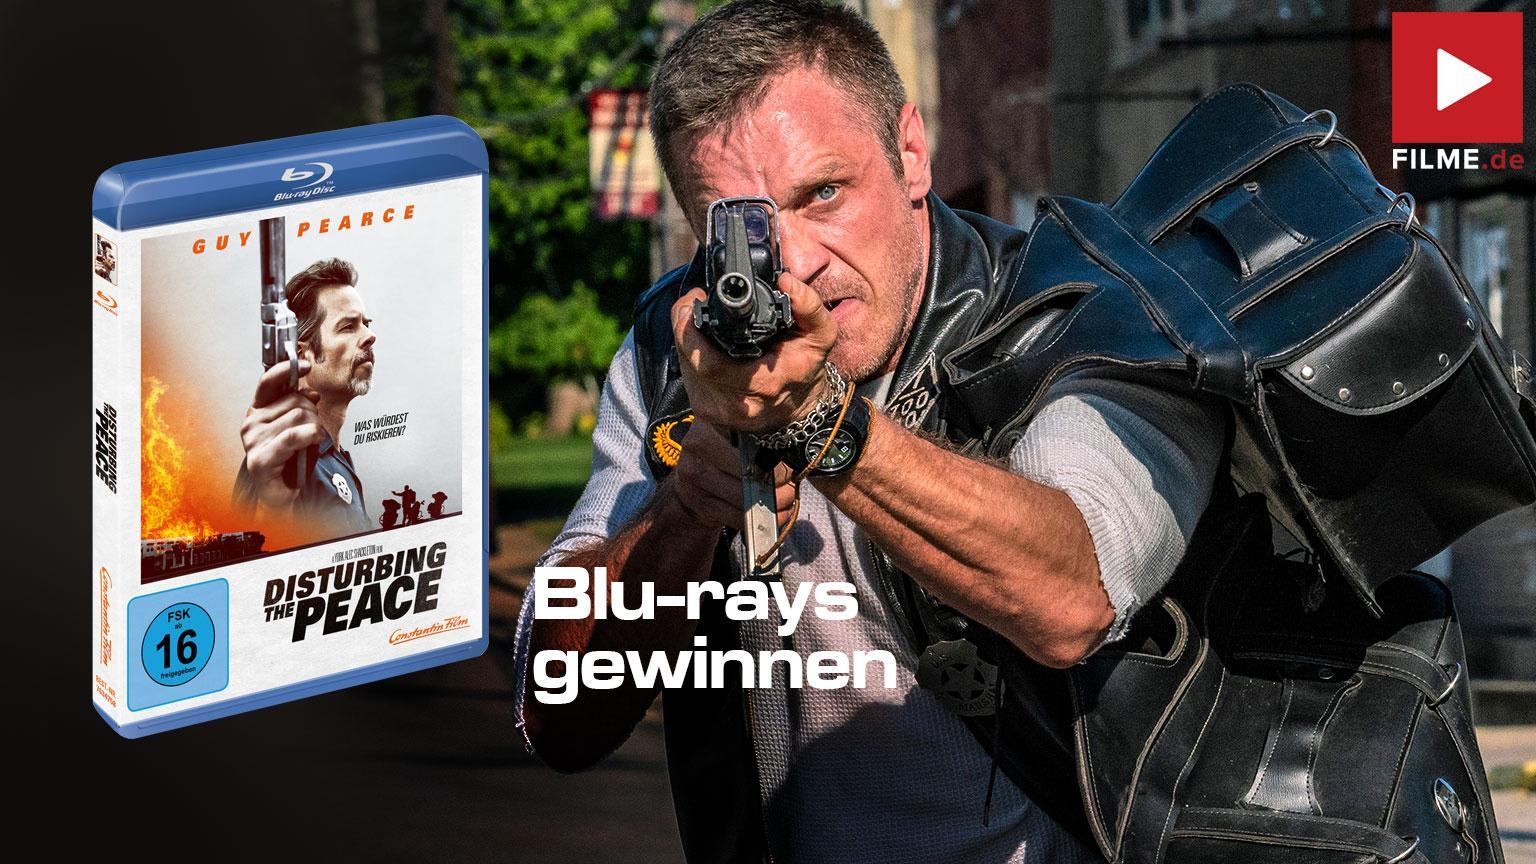 Disturbing The Peace [Blu-ray] Film 2020 Gewinnspiel gewinnen Artikelbild